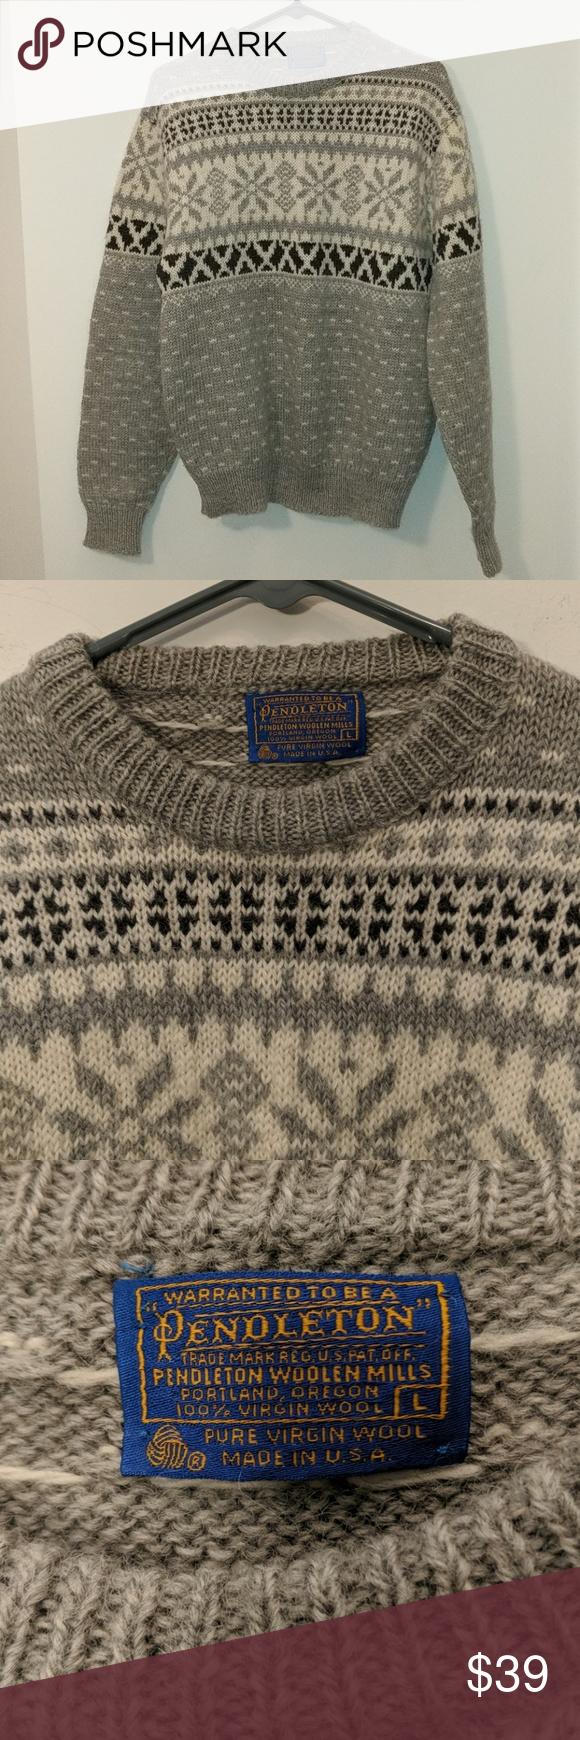 Pendleton Wool Sweater Made In Usa Size L In 2018 My Posh Picks